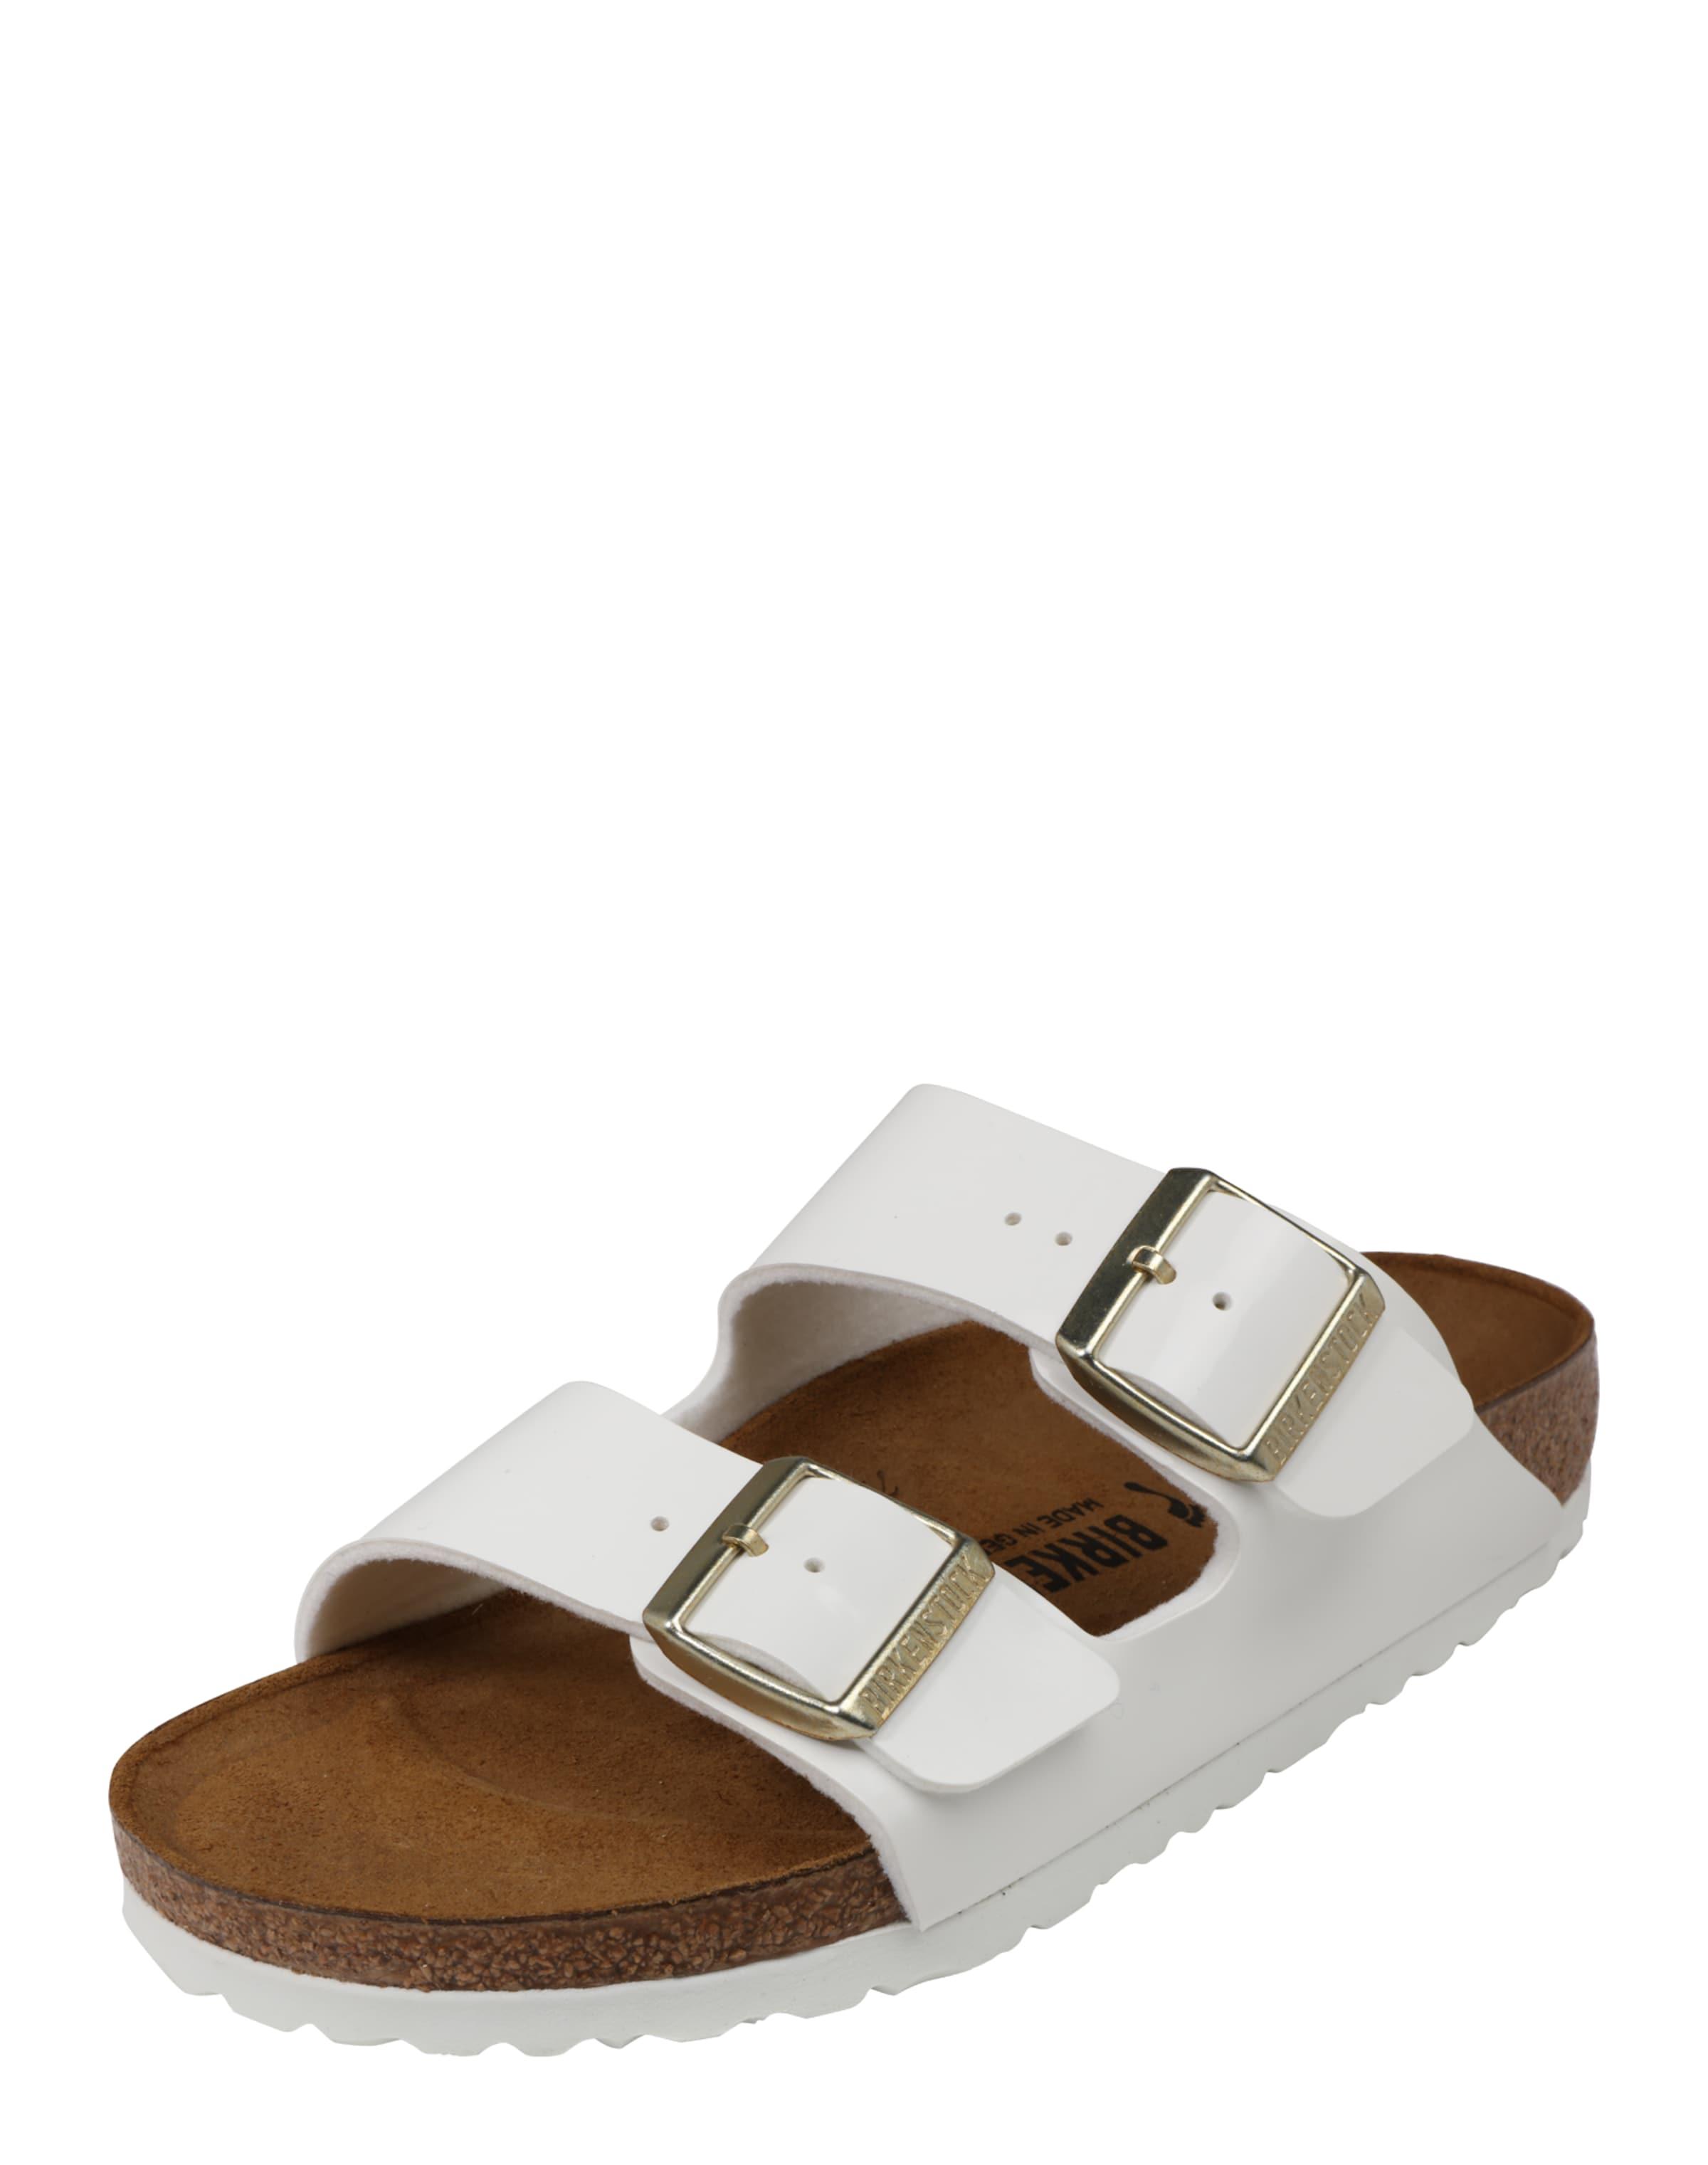 BIRKENSTOCK Arizona Pantolette schmal Verschleißfeste billige Schuhe